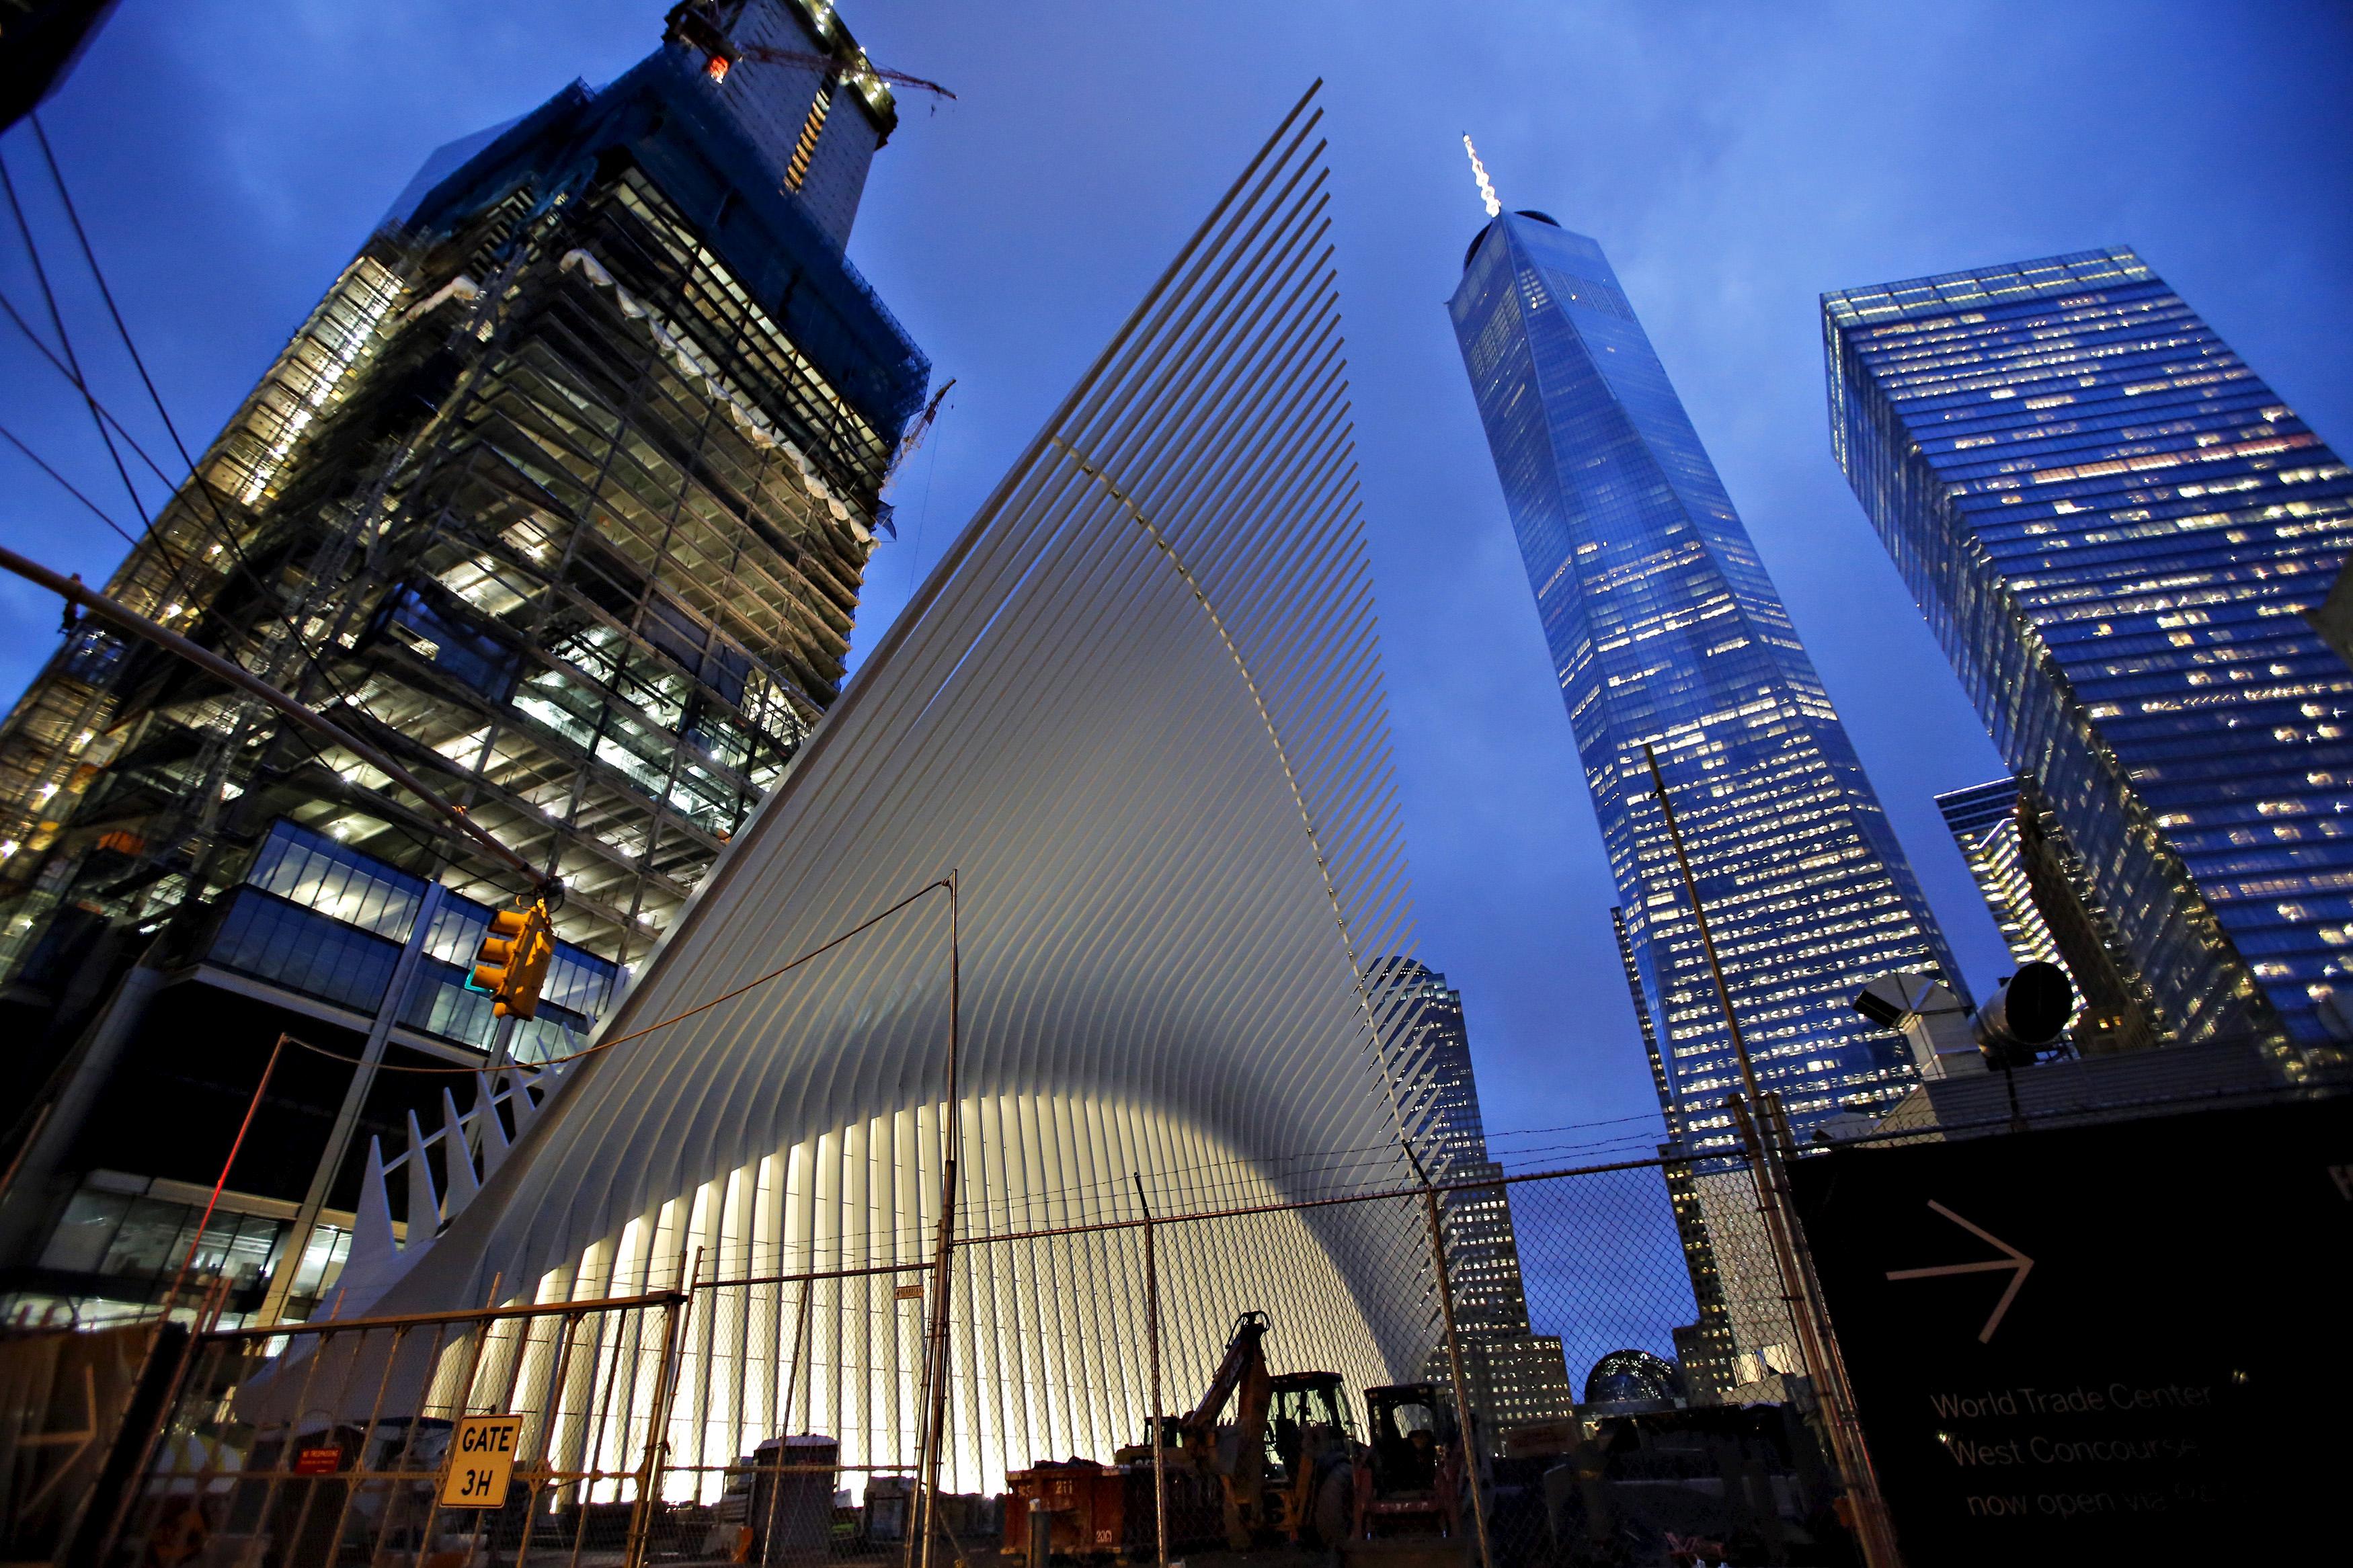 World Trade Center S Oculus 4 Billion New World Trade